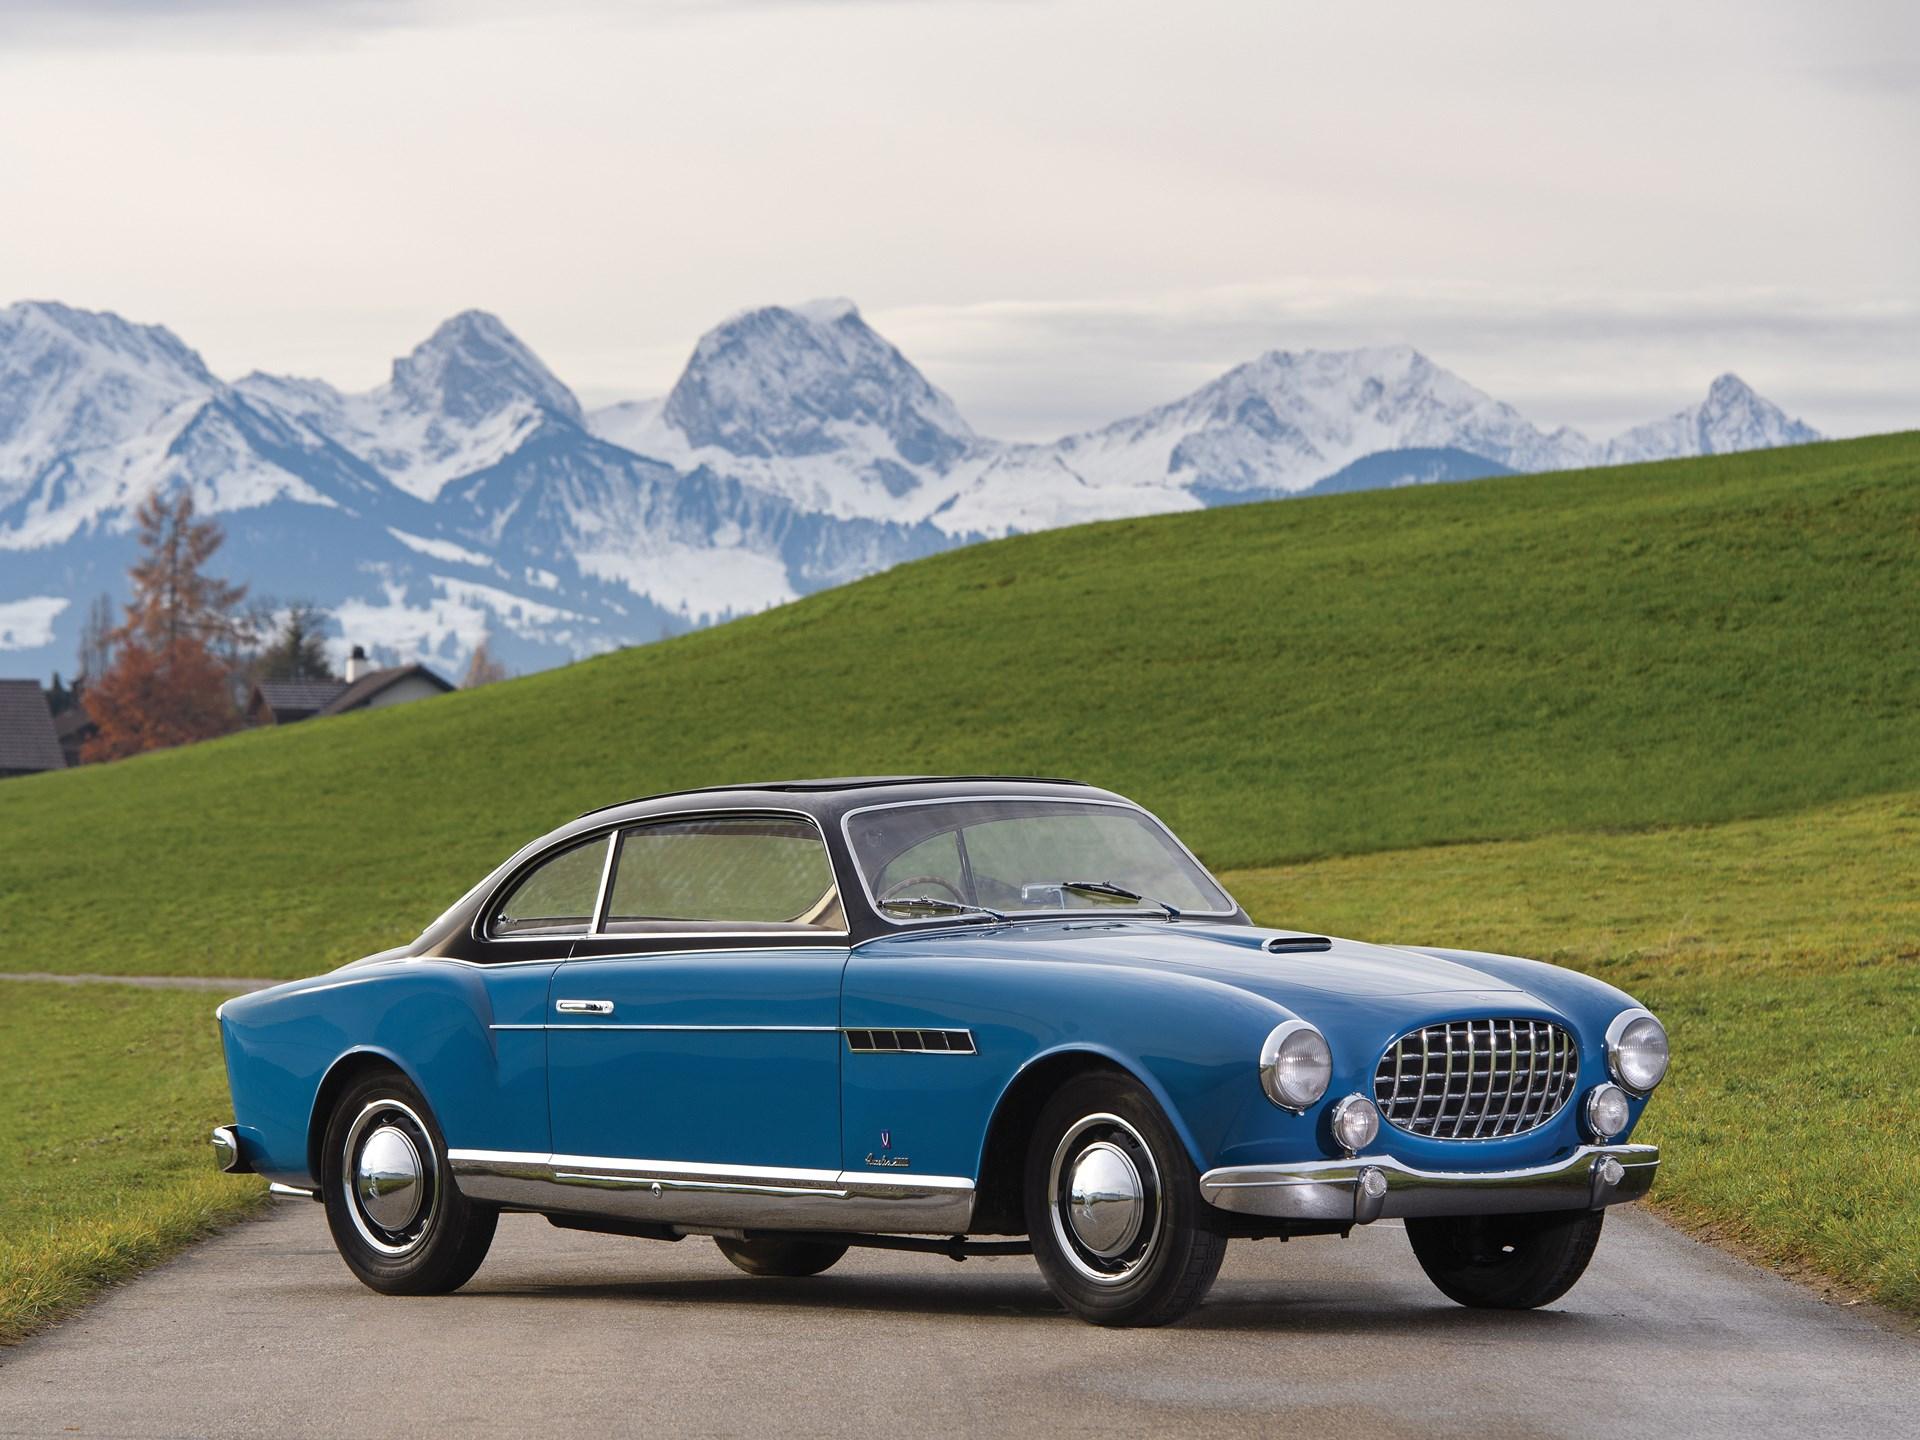 Lancia-Aurelia-B52-Coupe-Vignale-1952-1